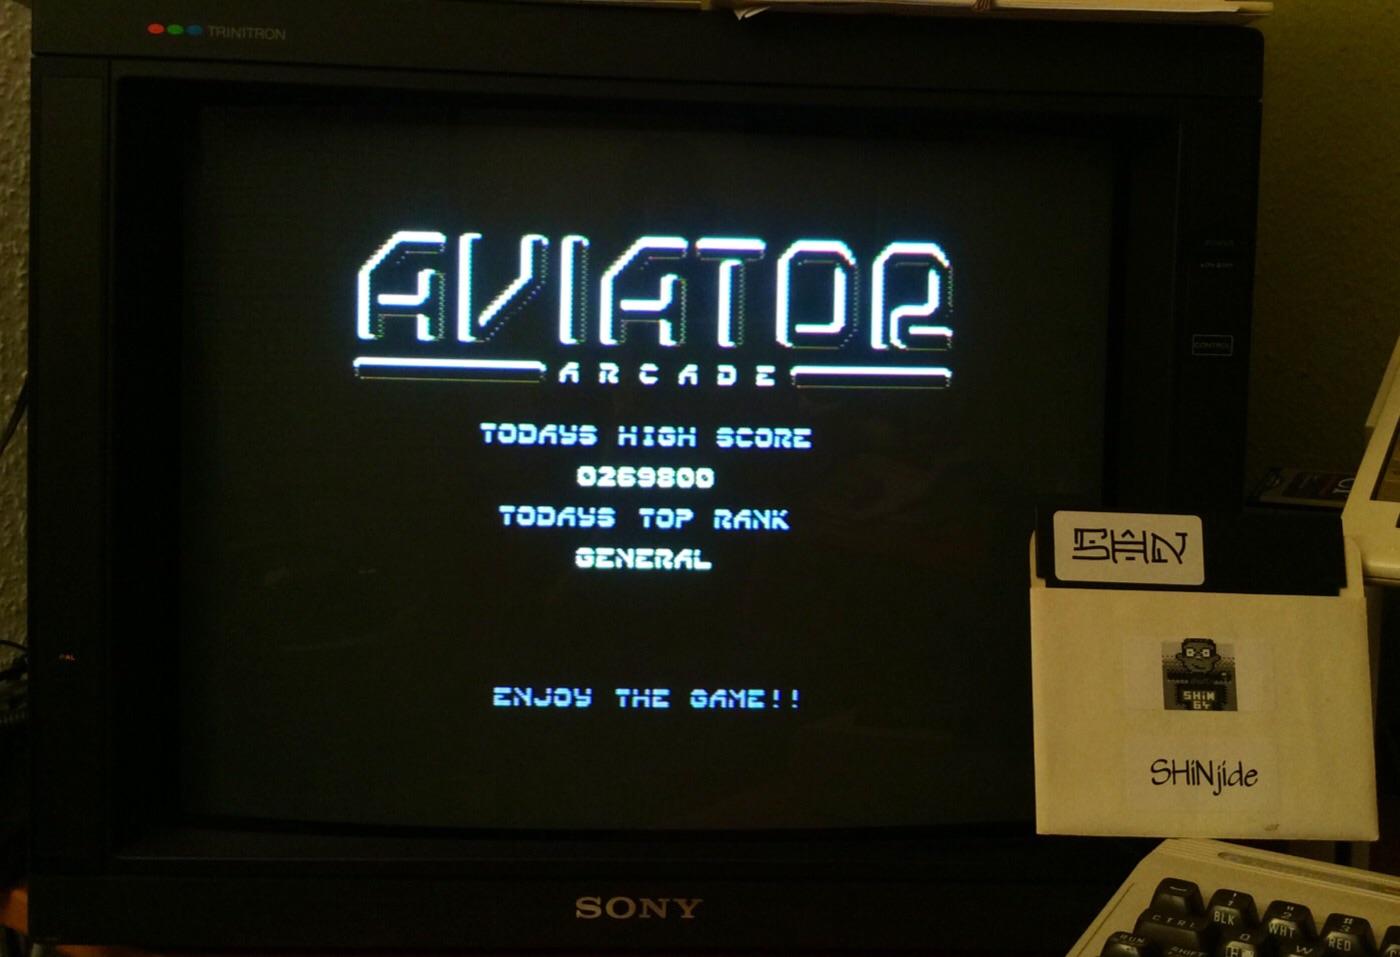 SHiNjide: Aviator Arcade (Commodore 64) 269,800 points on 2014-12-04 01:03:55